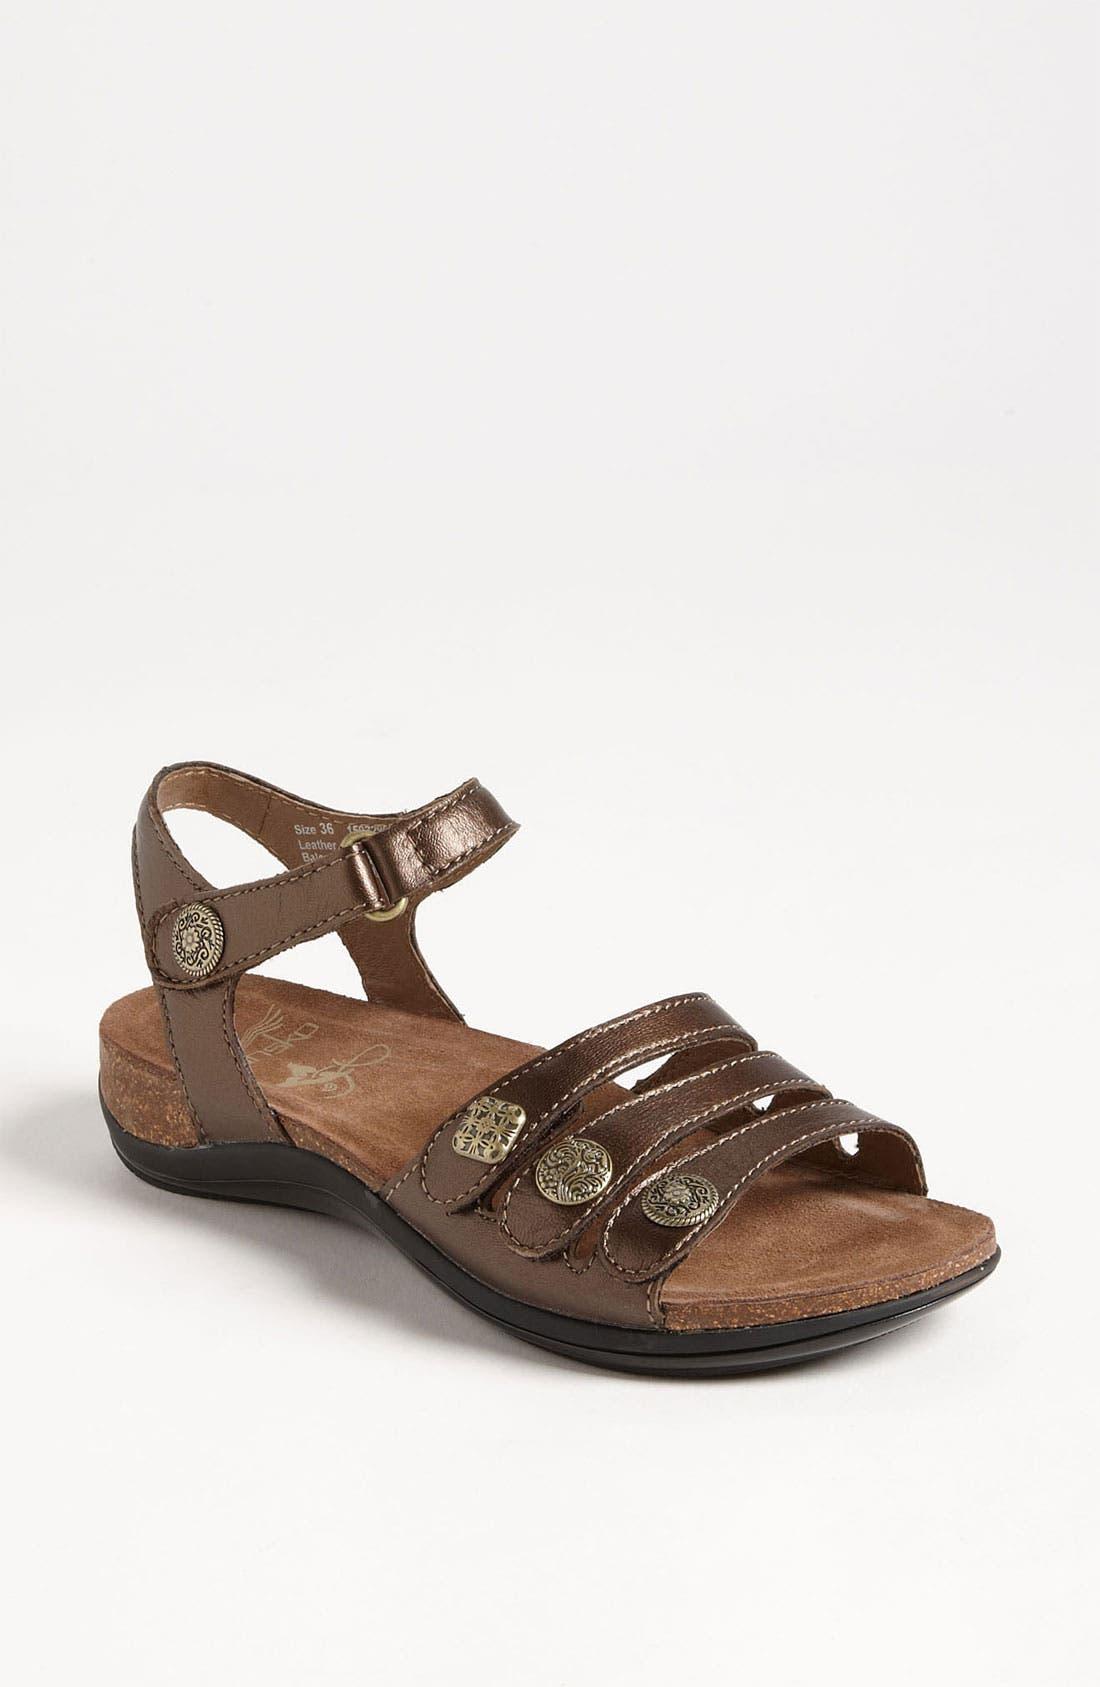 Alternate Image 1 Selected - Dansko 'Jess' Sandal